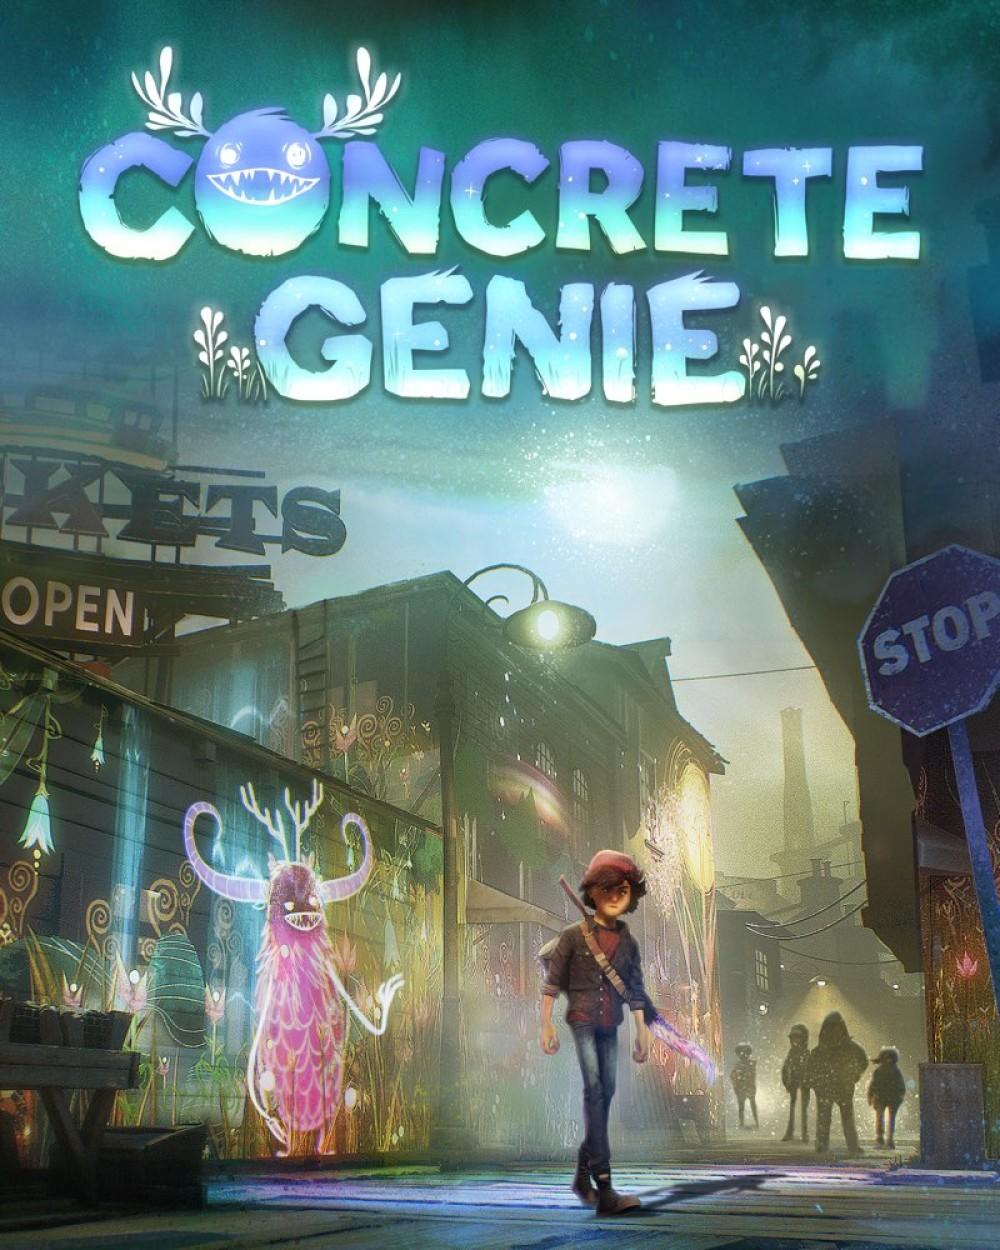 Concrete Genie: Διαθέσιμο με Ελληνικό μενού και υπότιτλους!